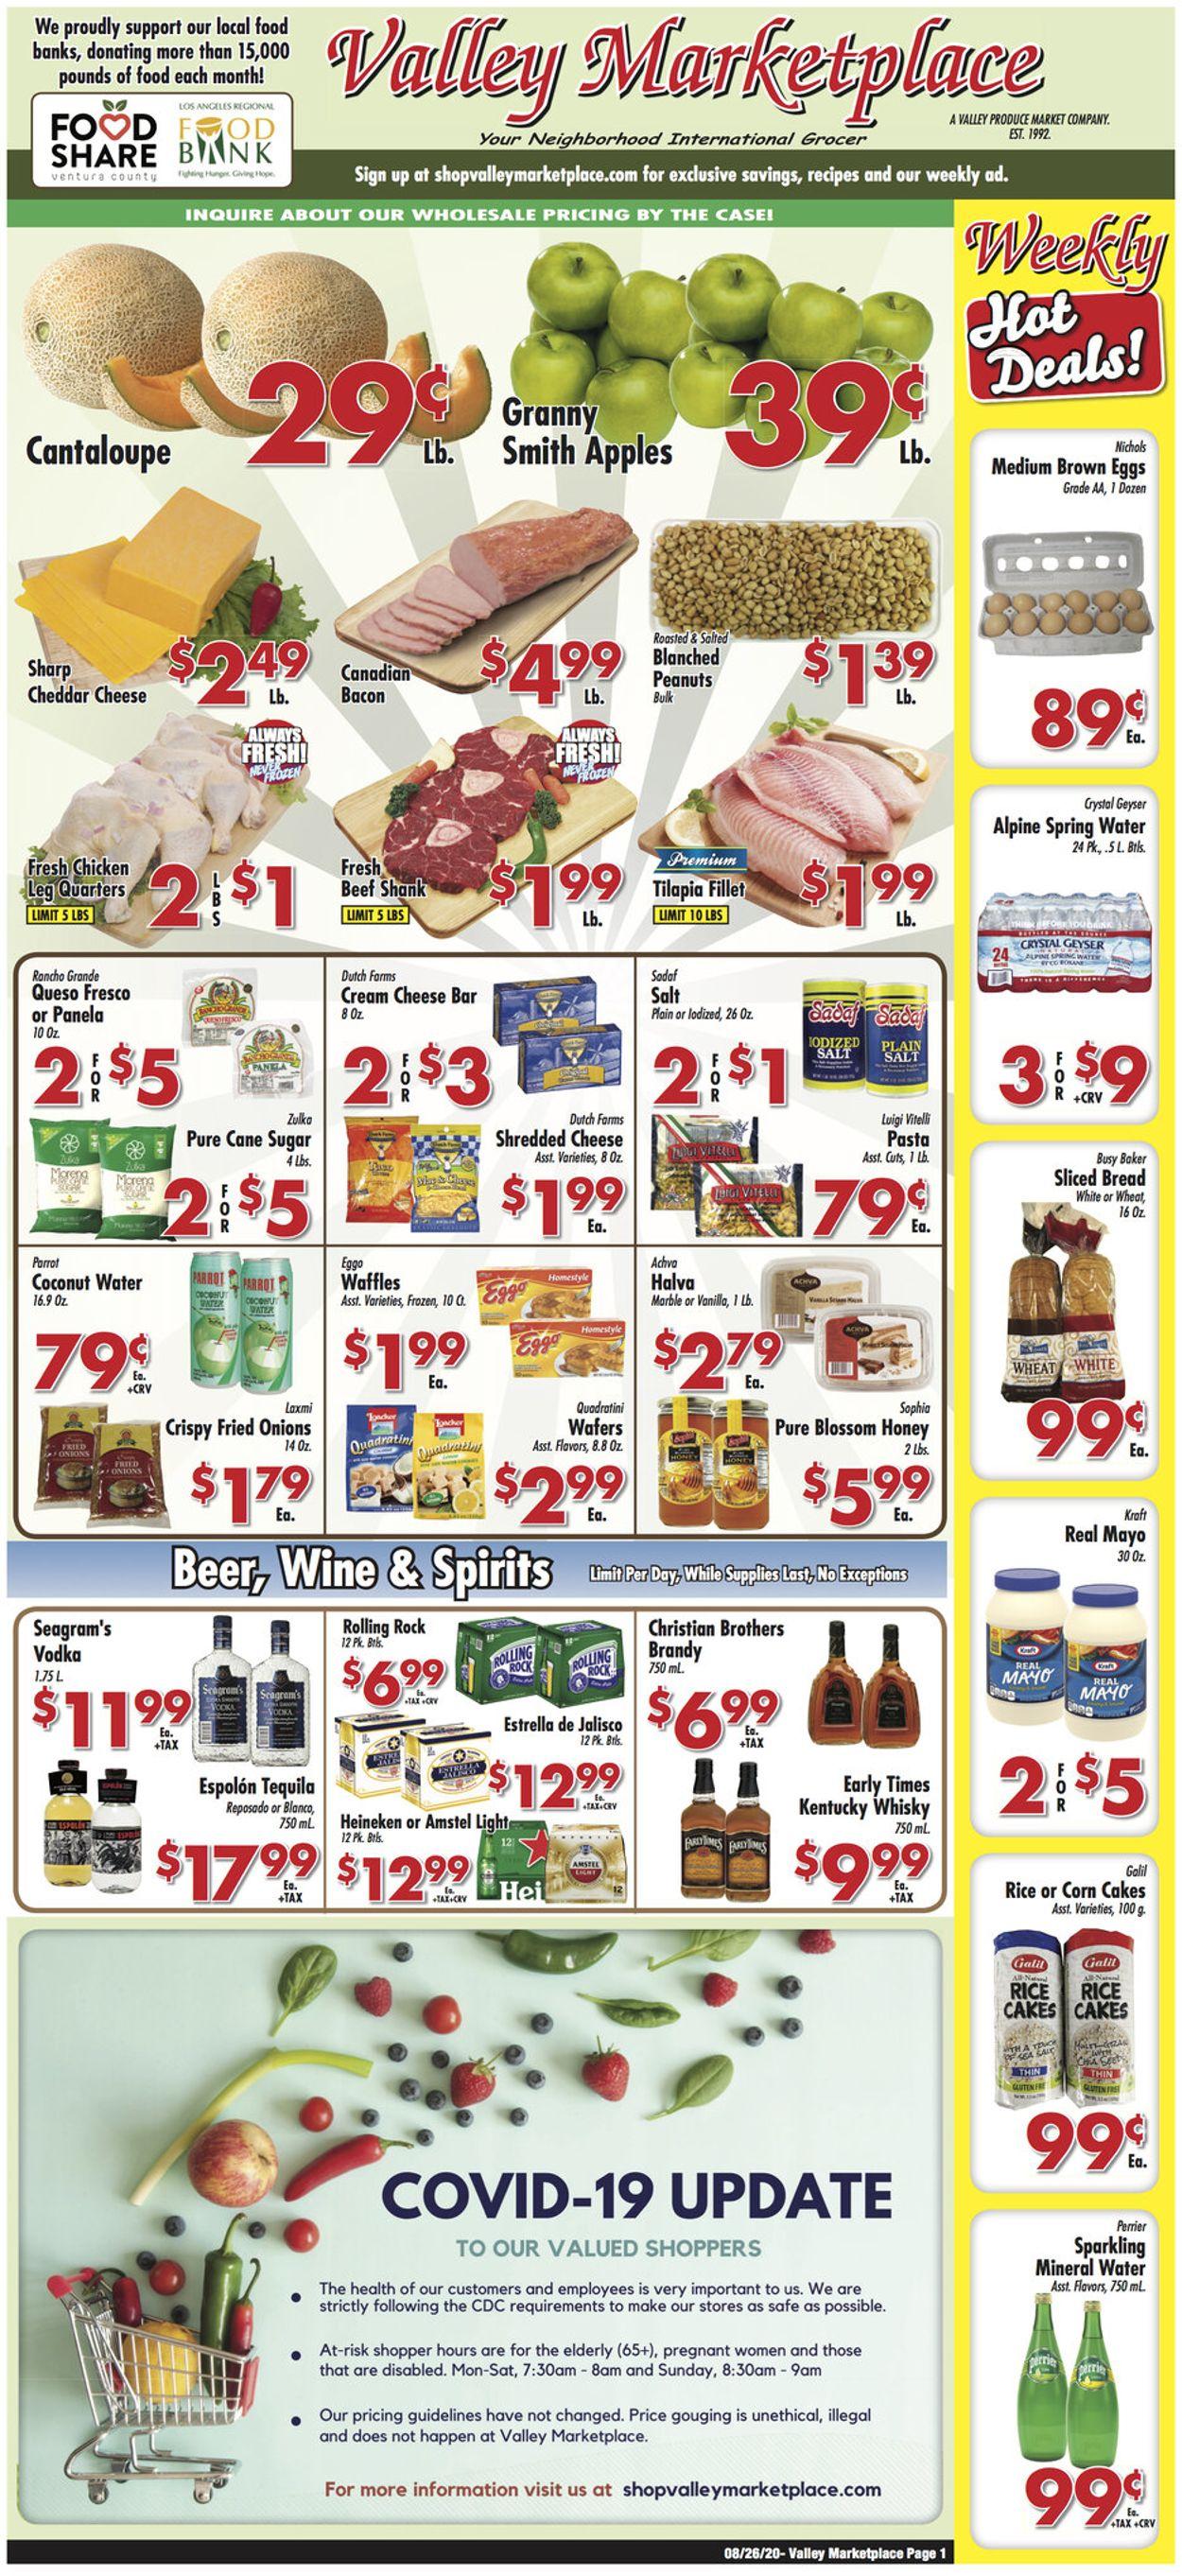 Valley Marketplace Weekly Ad Circular - valid 08/25-09/01/2020